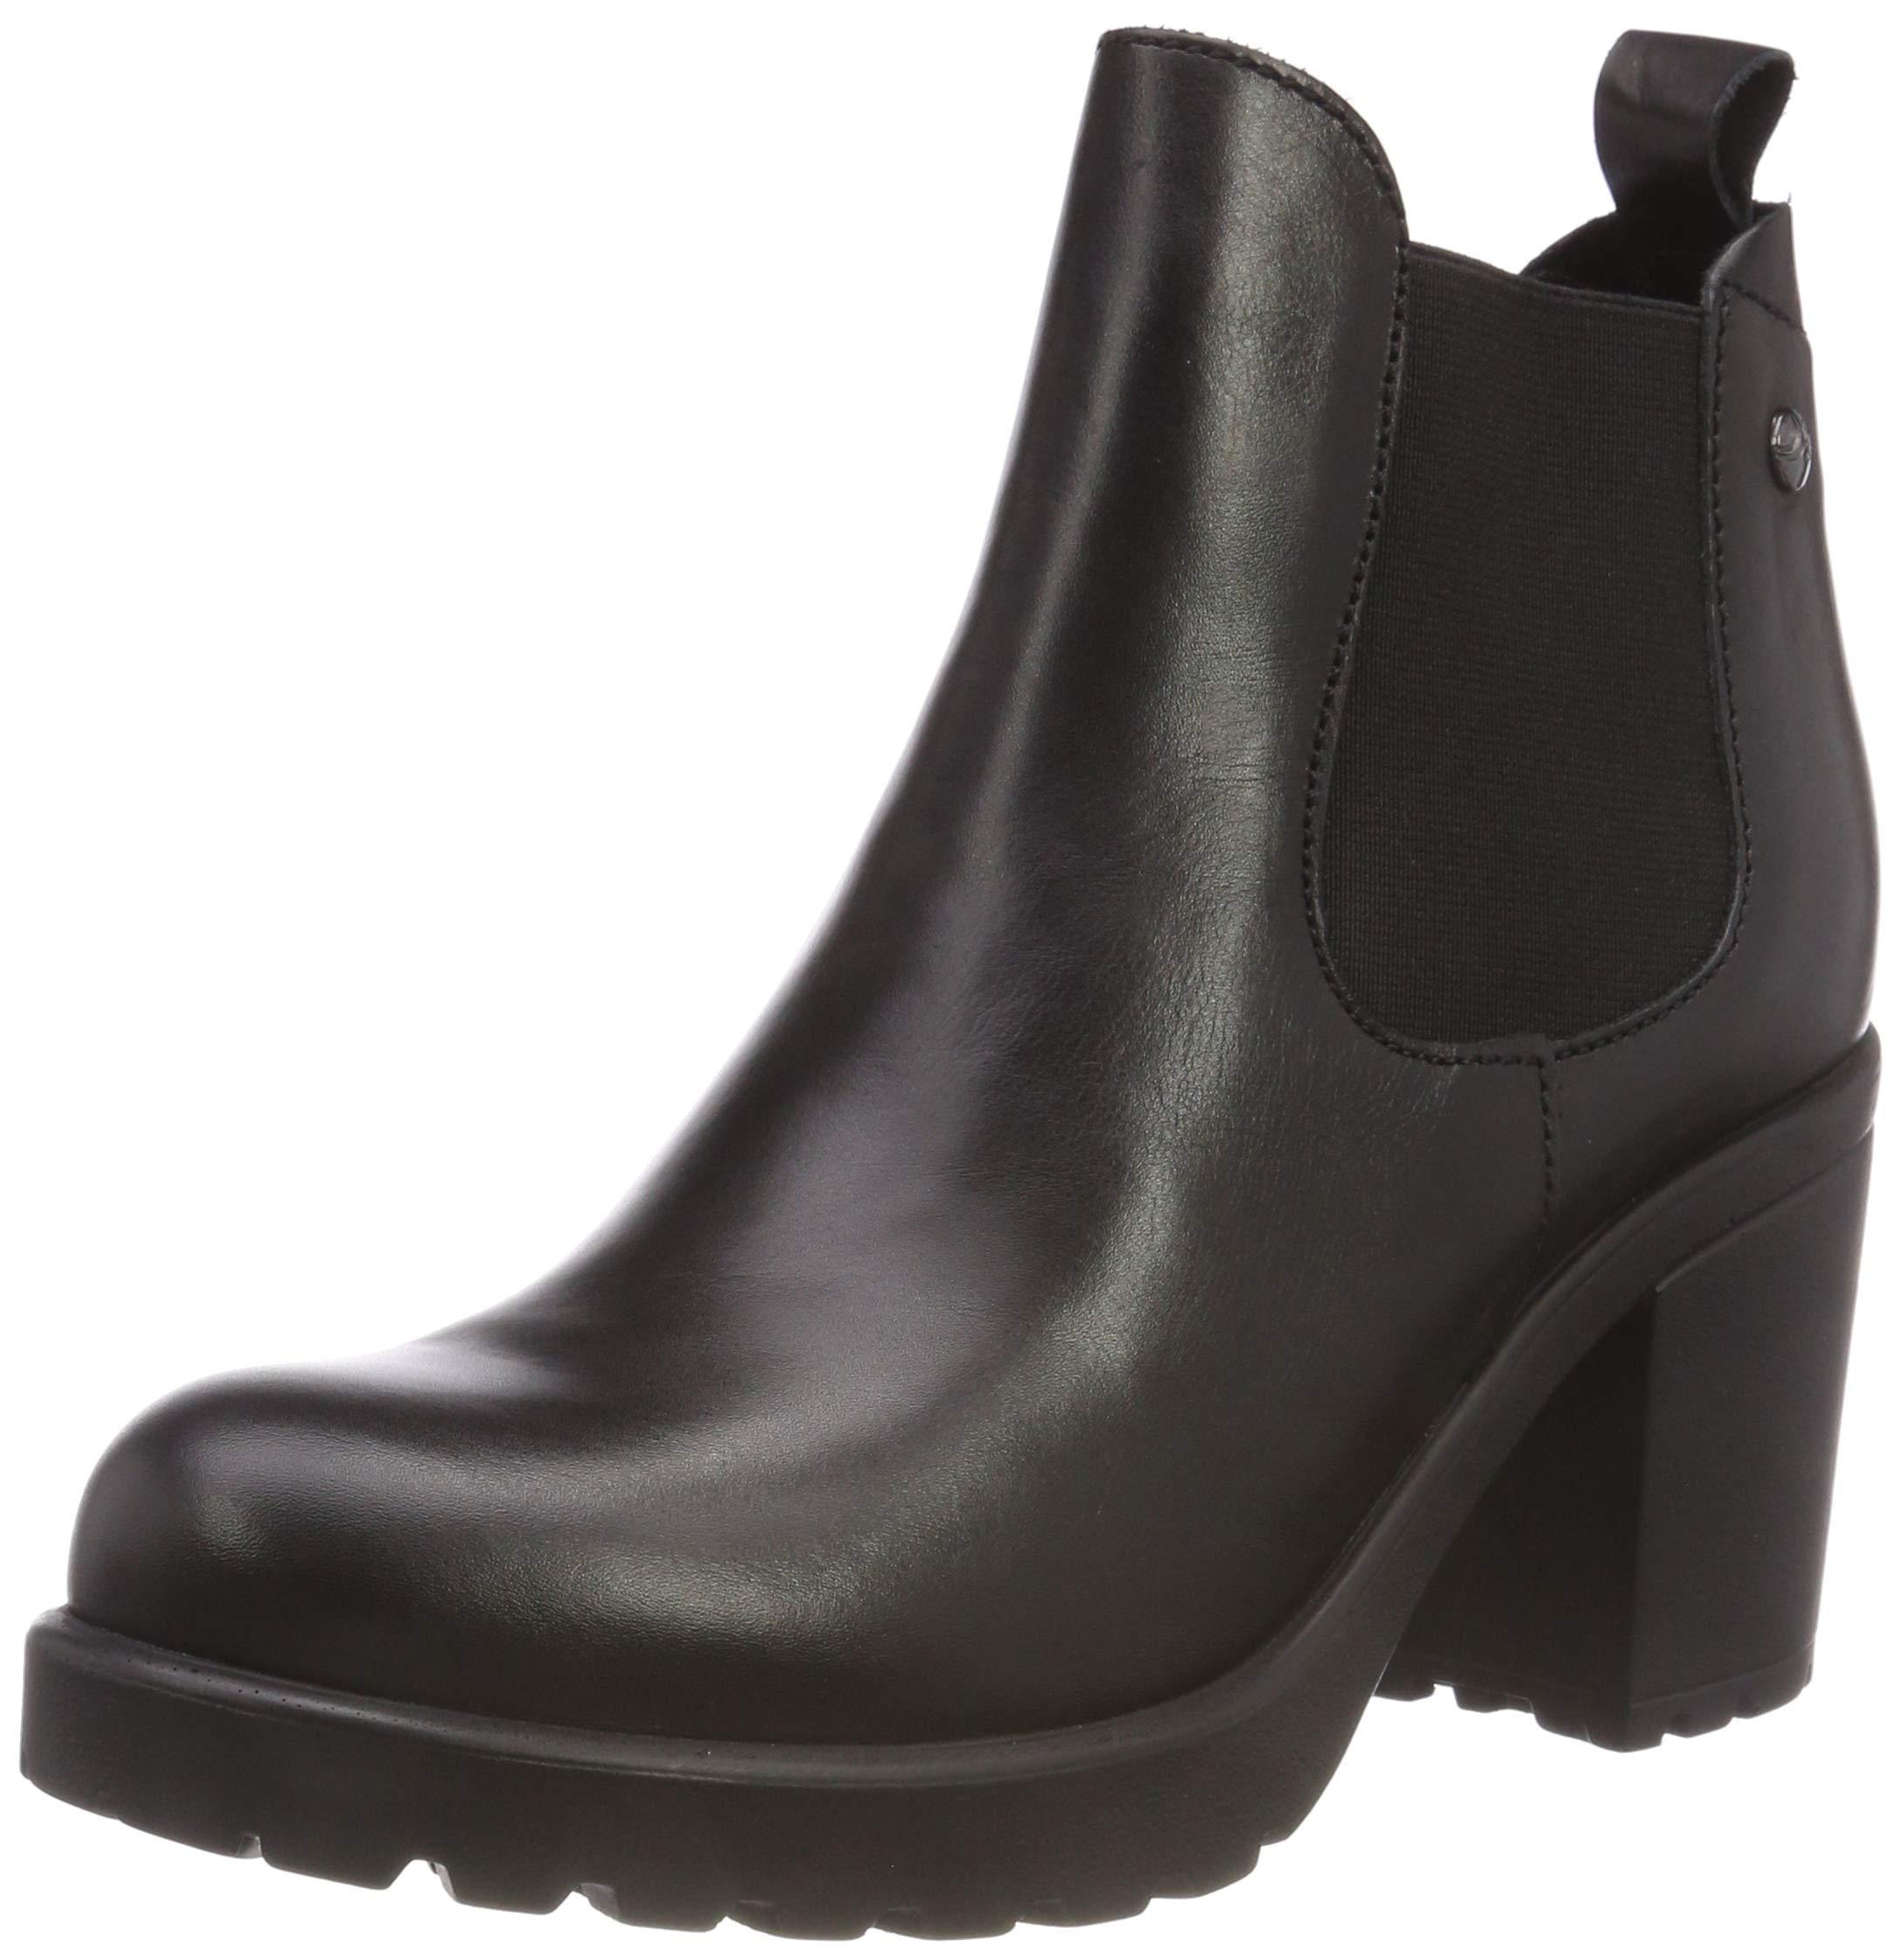 Leather 25410Bottes Chelsea FemmeNoirblack 5 Eu 5 oliver 337 S zGqUMVSp